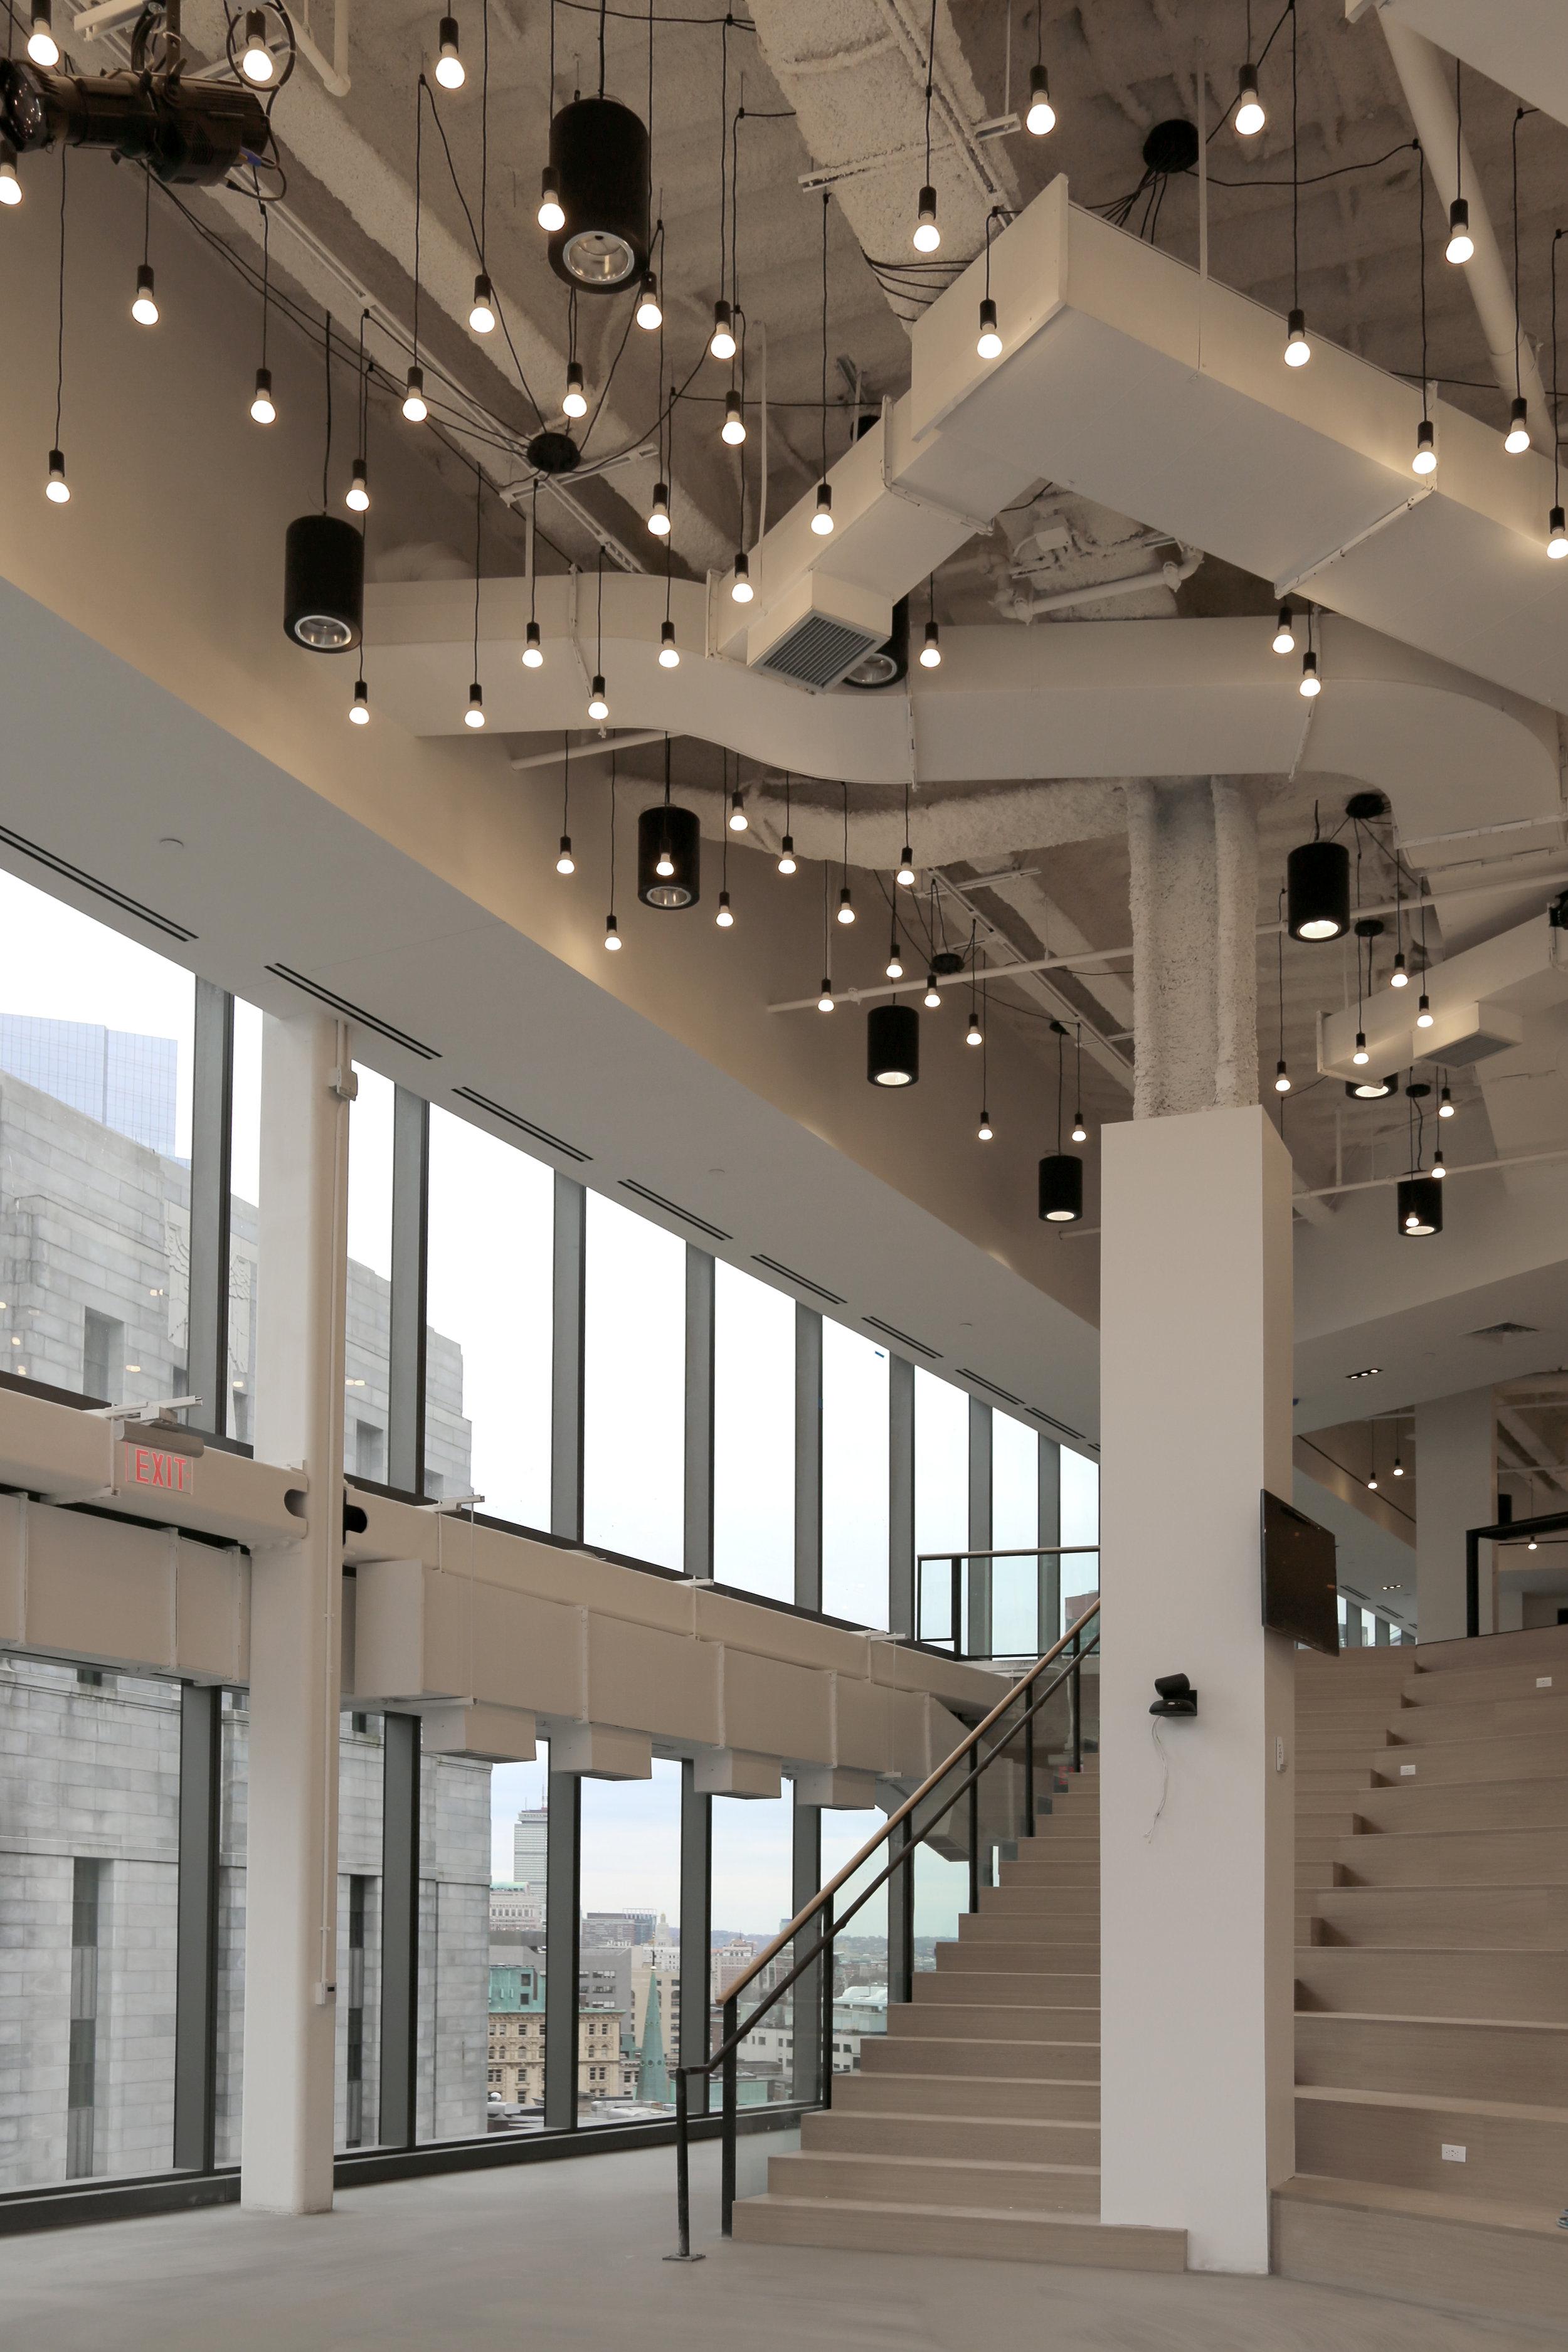 Amphitheater Custom Railing with Black Steel Handrail - Spaceworks AI.jpg